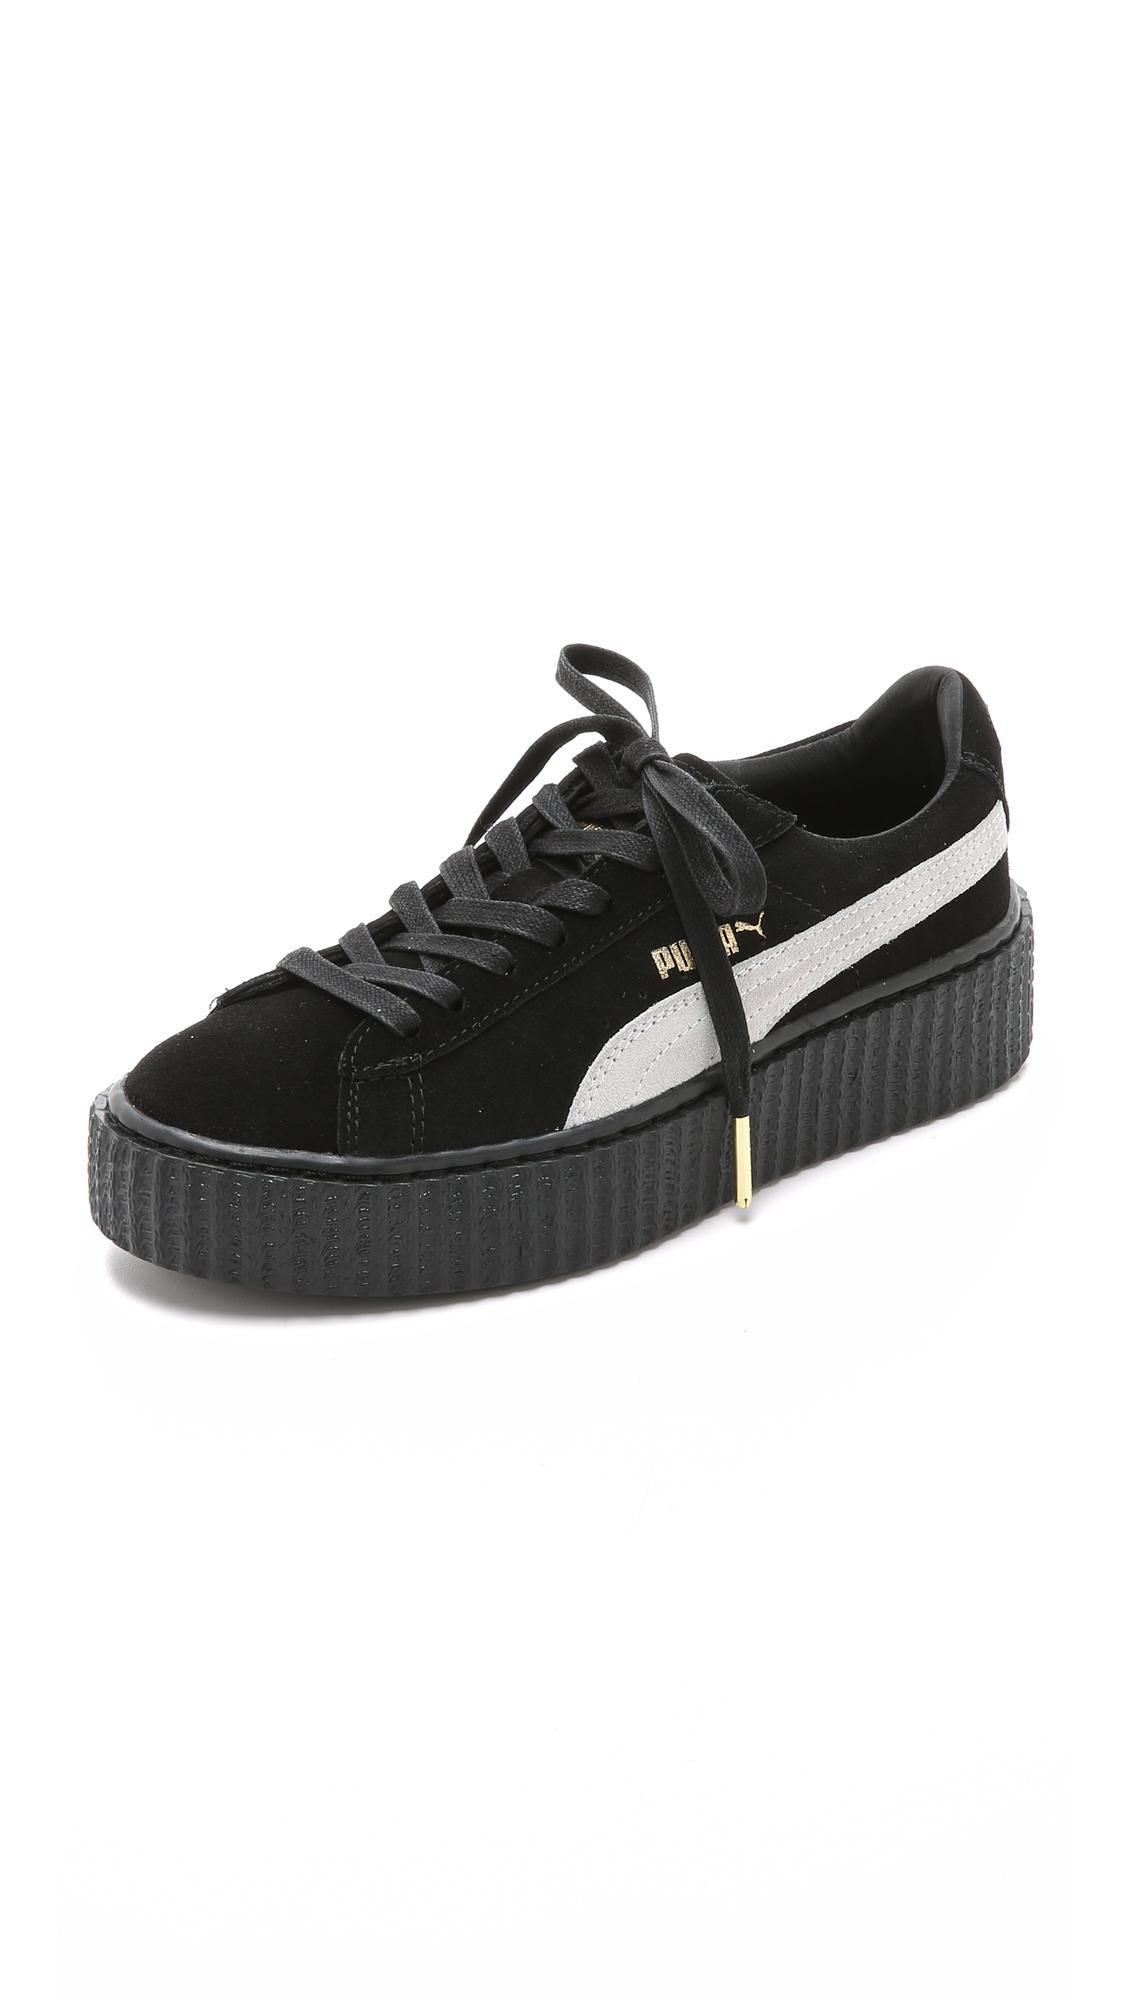 puma x rihanna creeper sneakers black in black lyst. Black Bedroom Furniture Sets. Home Design Ideas